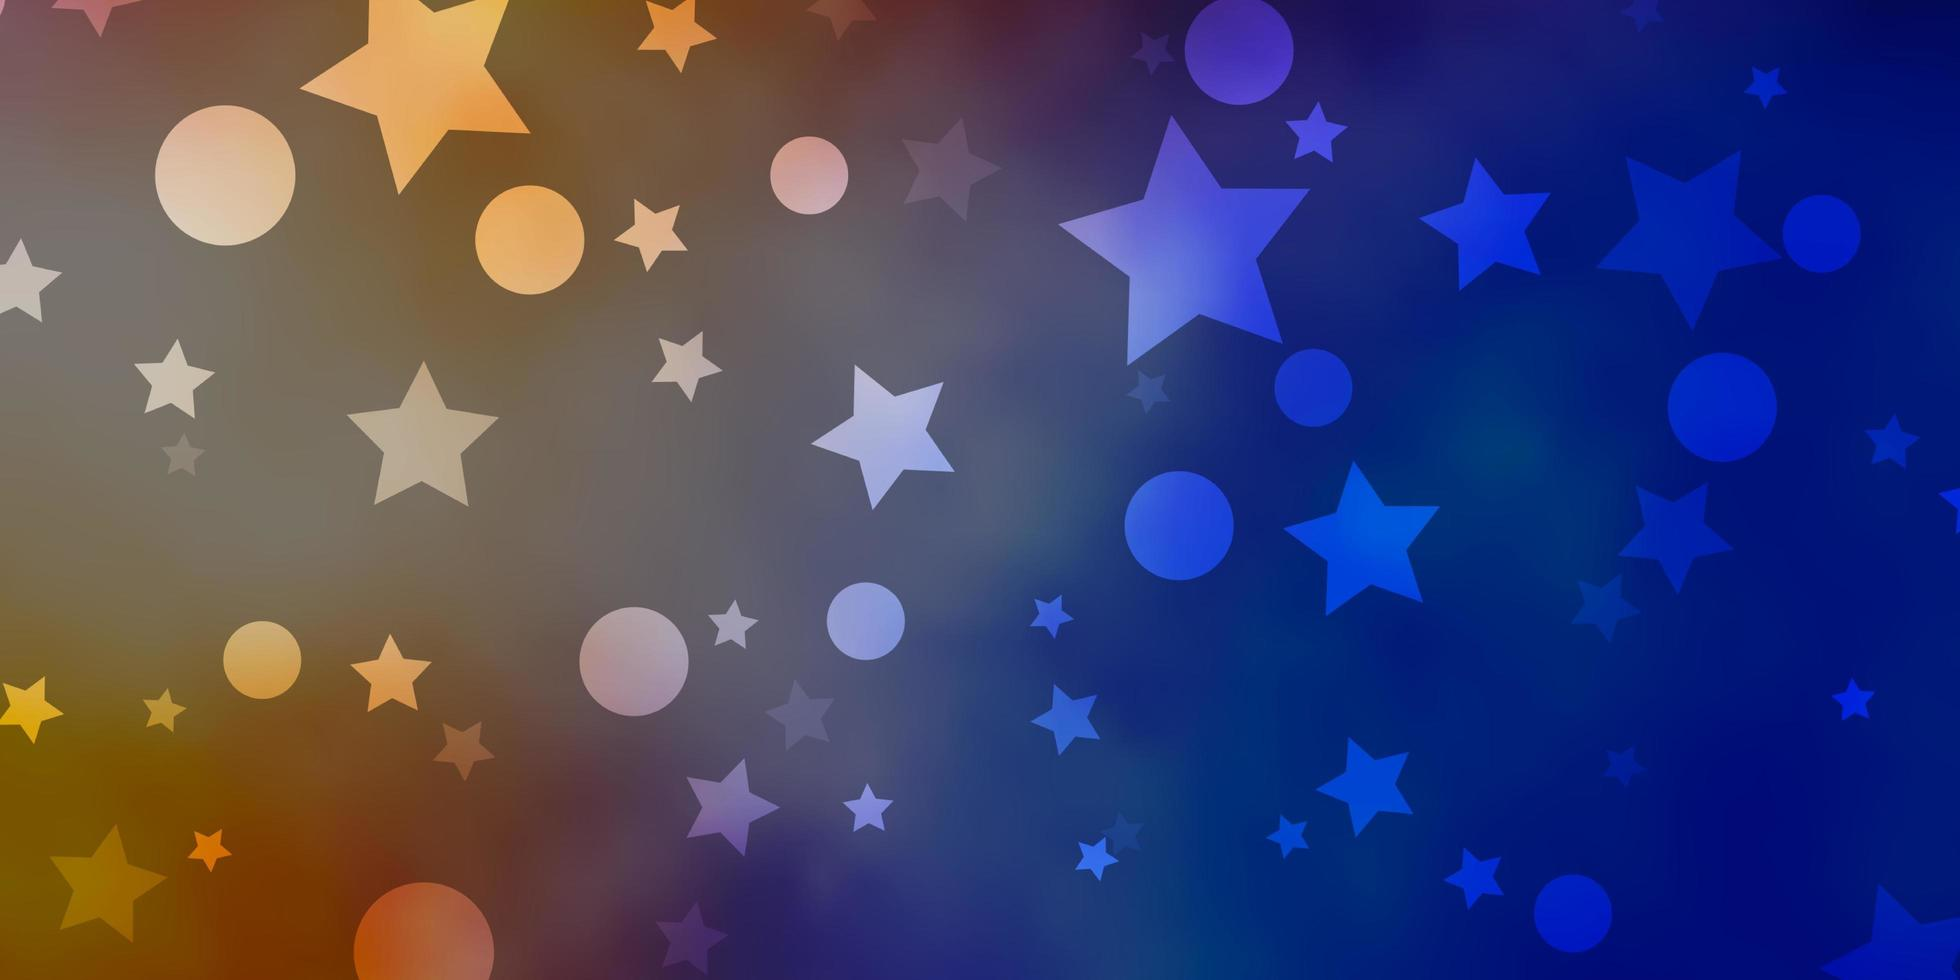 fundo azul, amarelo com círculos, estrelas. vetor